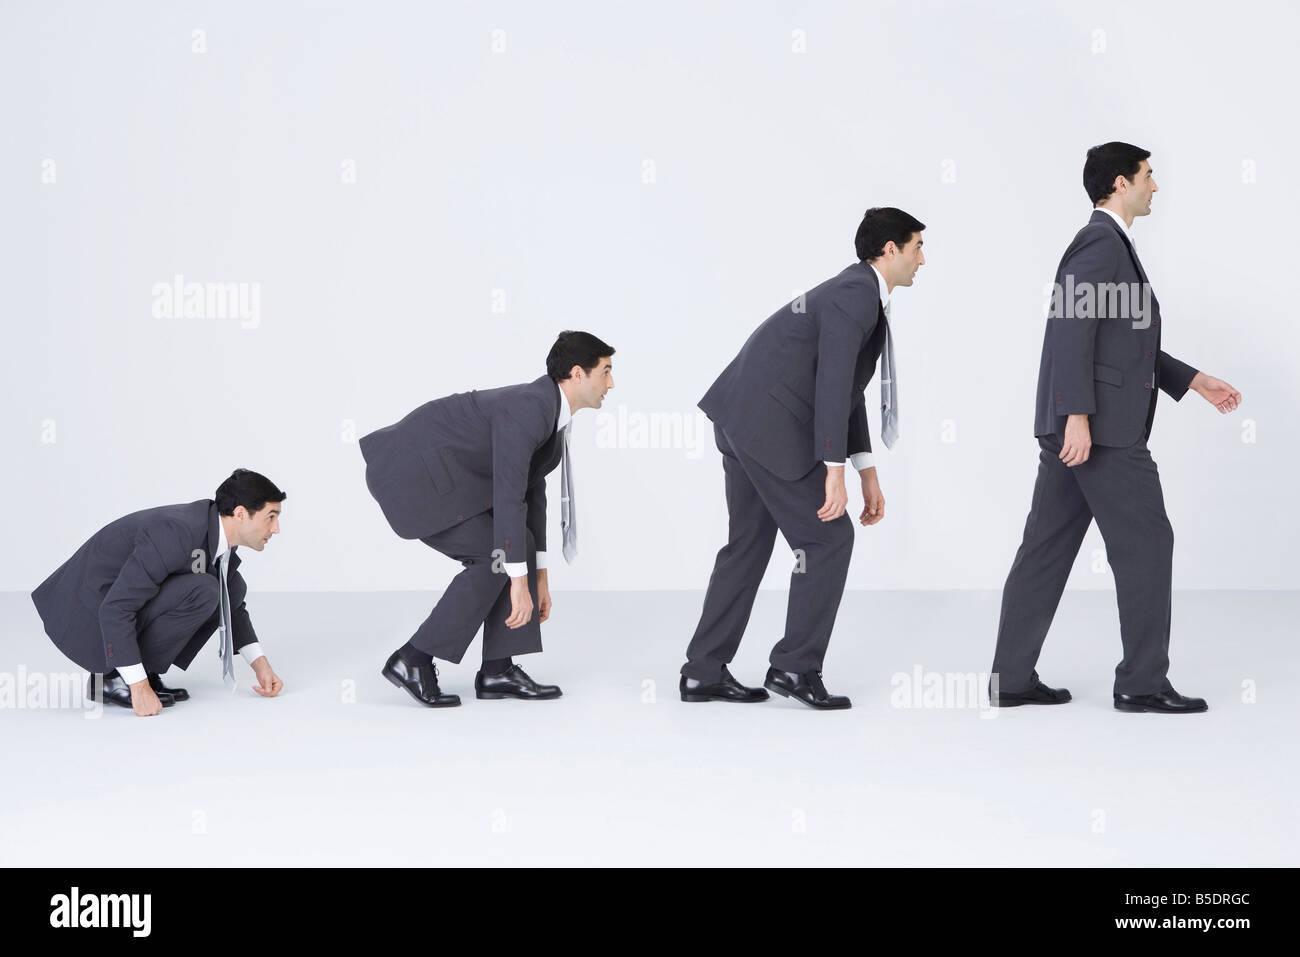 Businessman evolving, digital composite - Stock Image